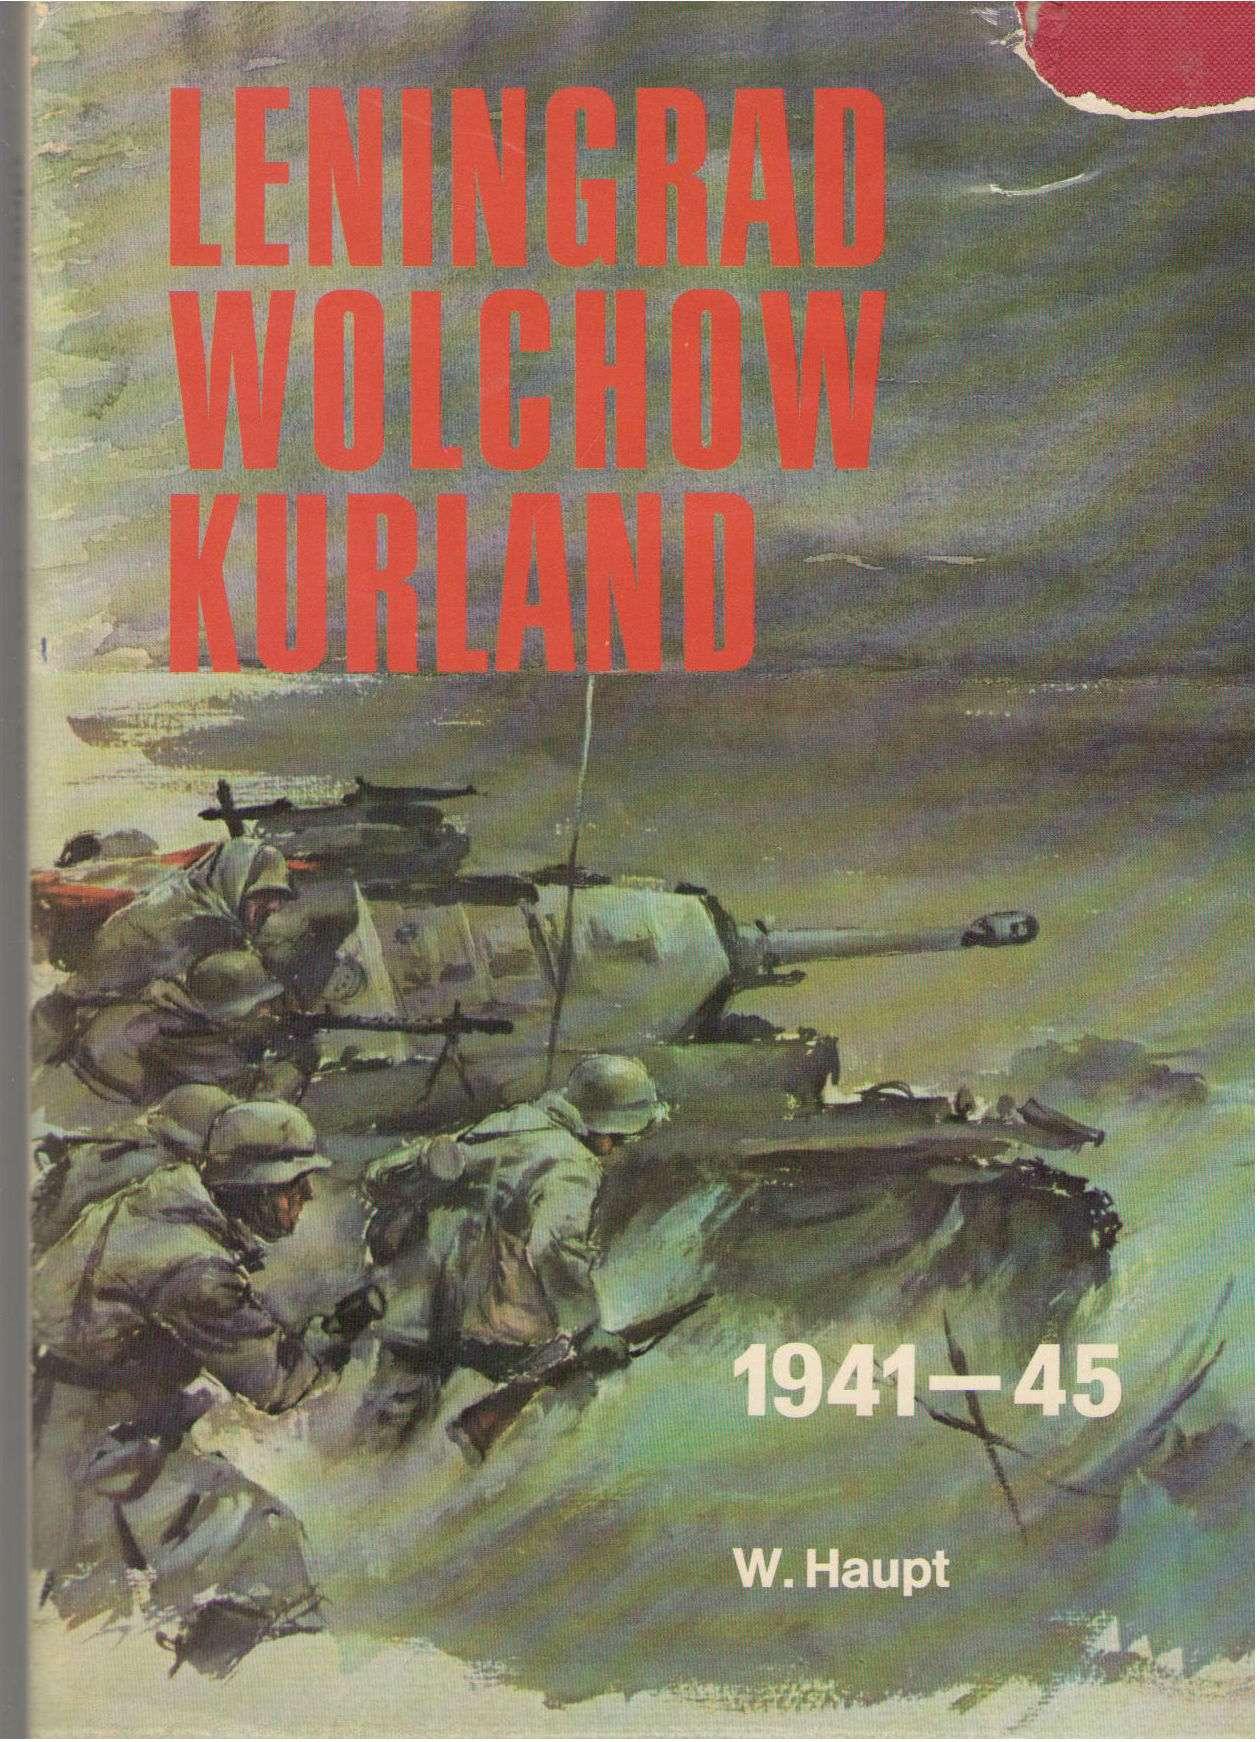 LENINGRAD, WOLCHOW, KURLAND, 1941-1945.